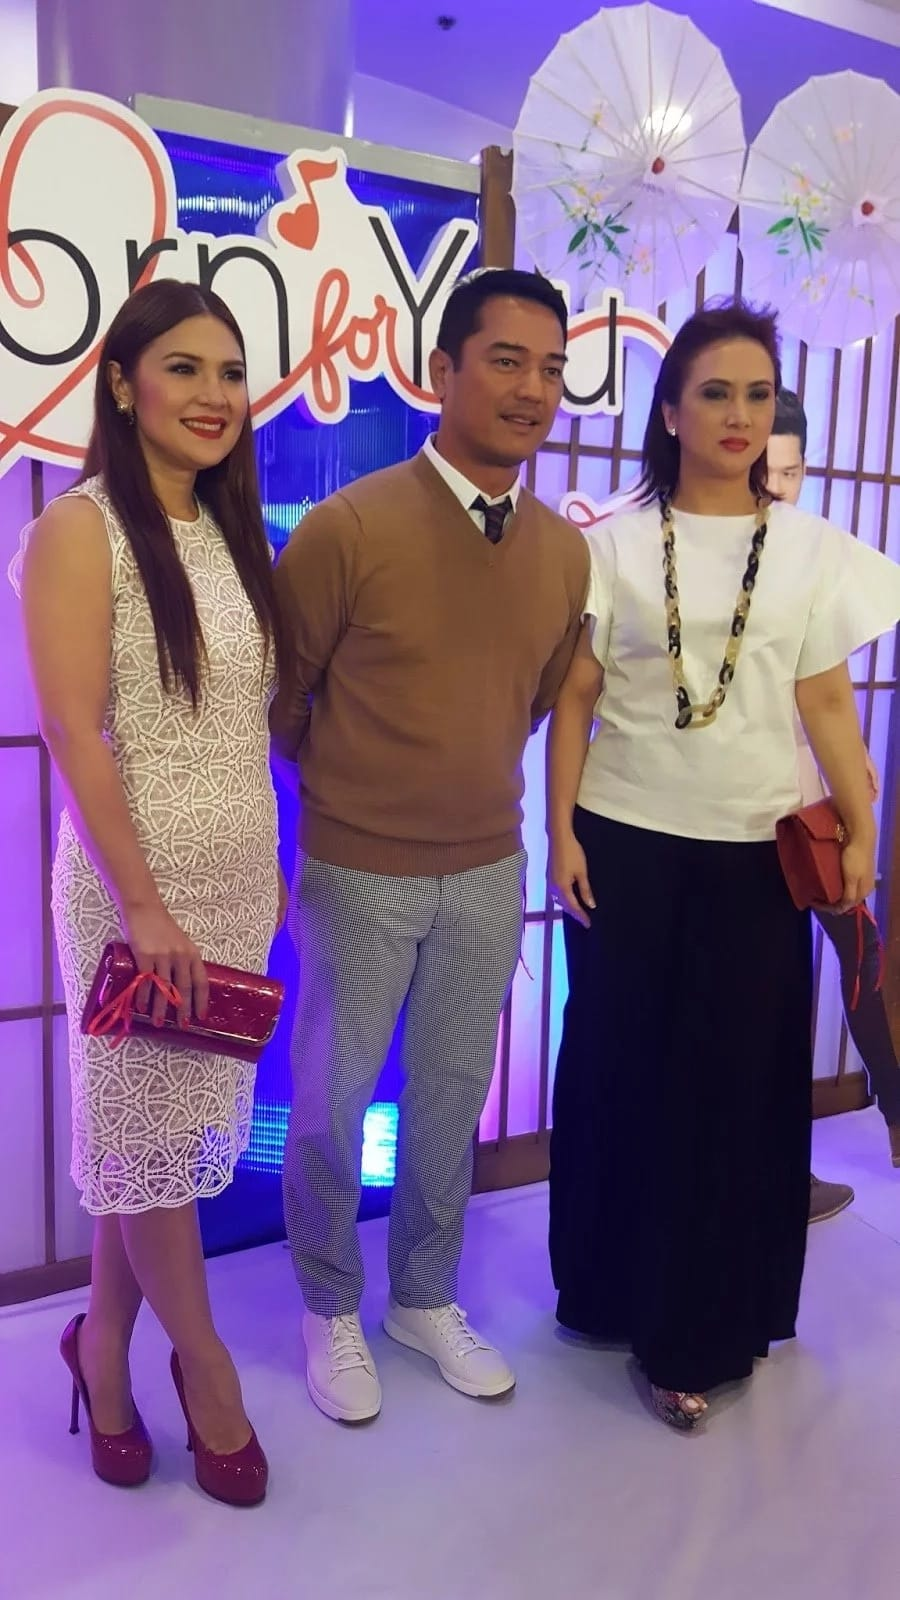 Ariel Rivera's reason on returning to Kapamilya Network: He needs money